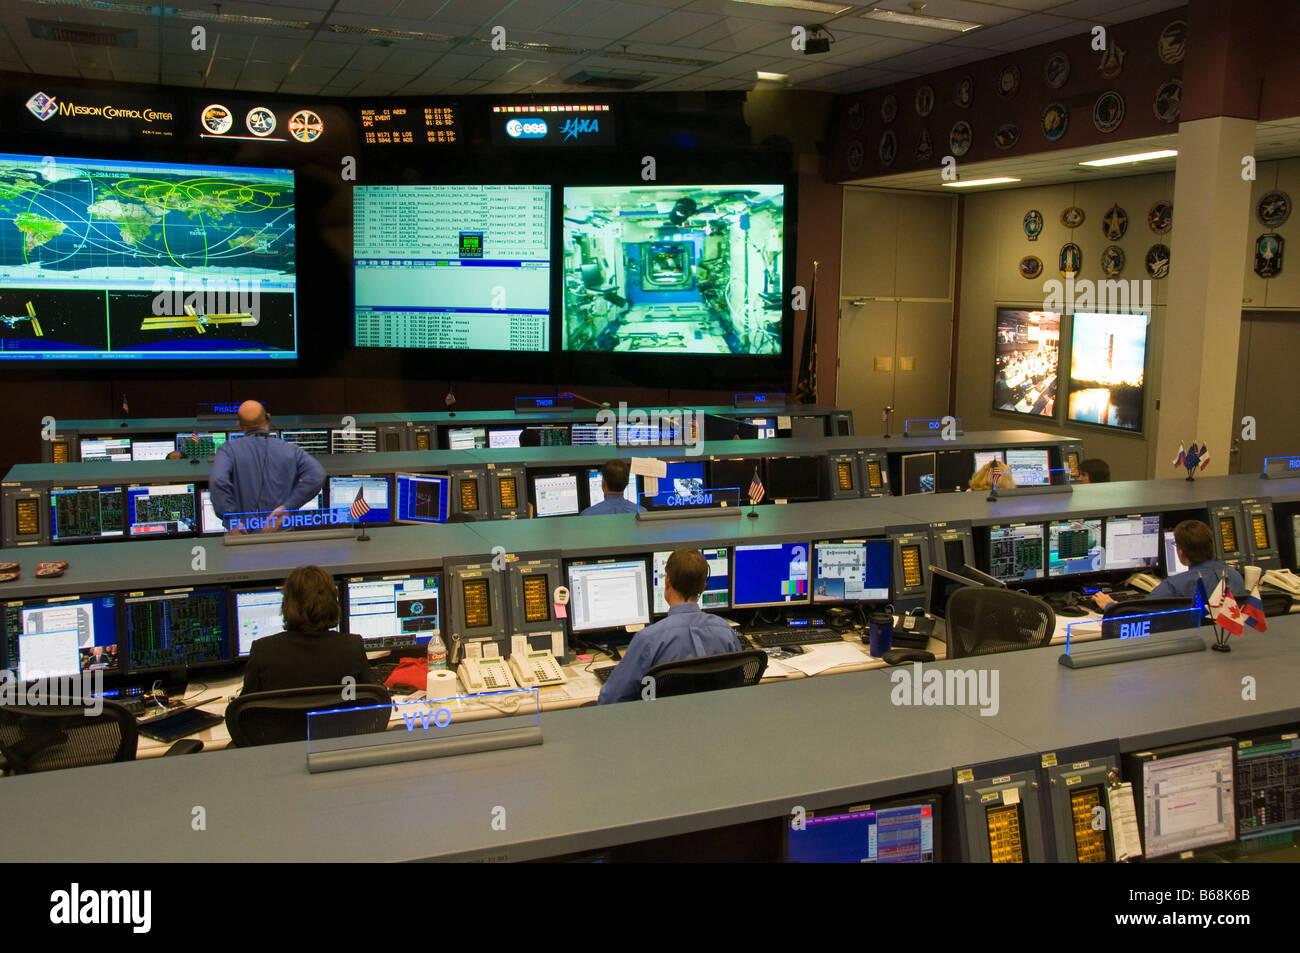 NASA Spacelab Mission Control Center, Johnson Space Center, Houston, Texas. - Stock Image